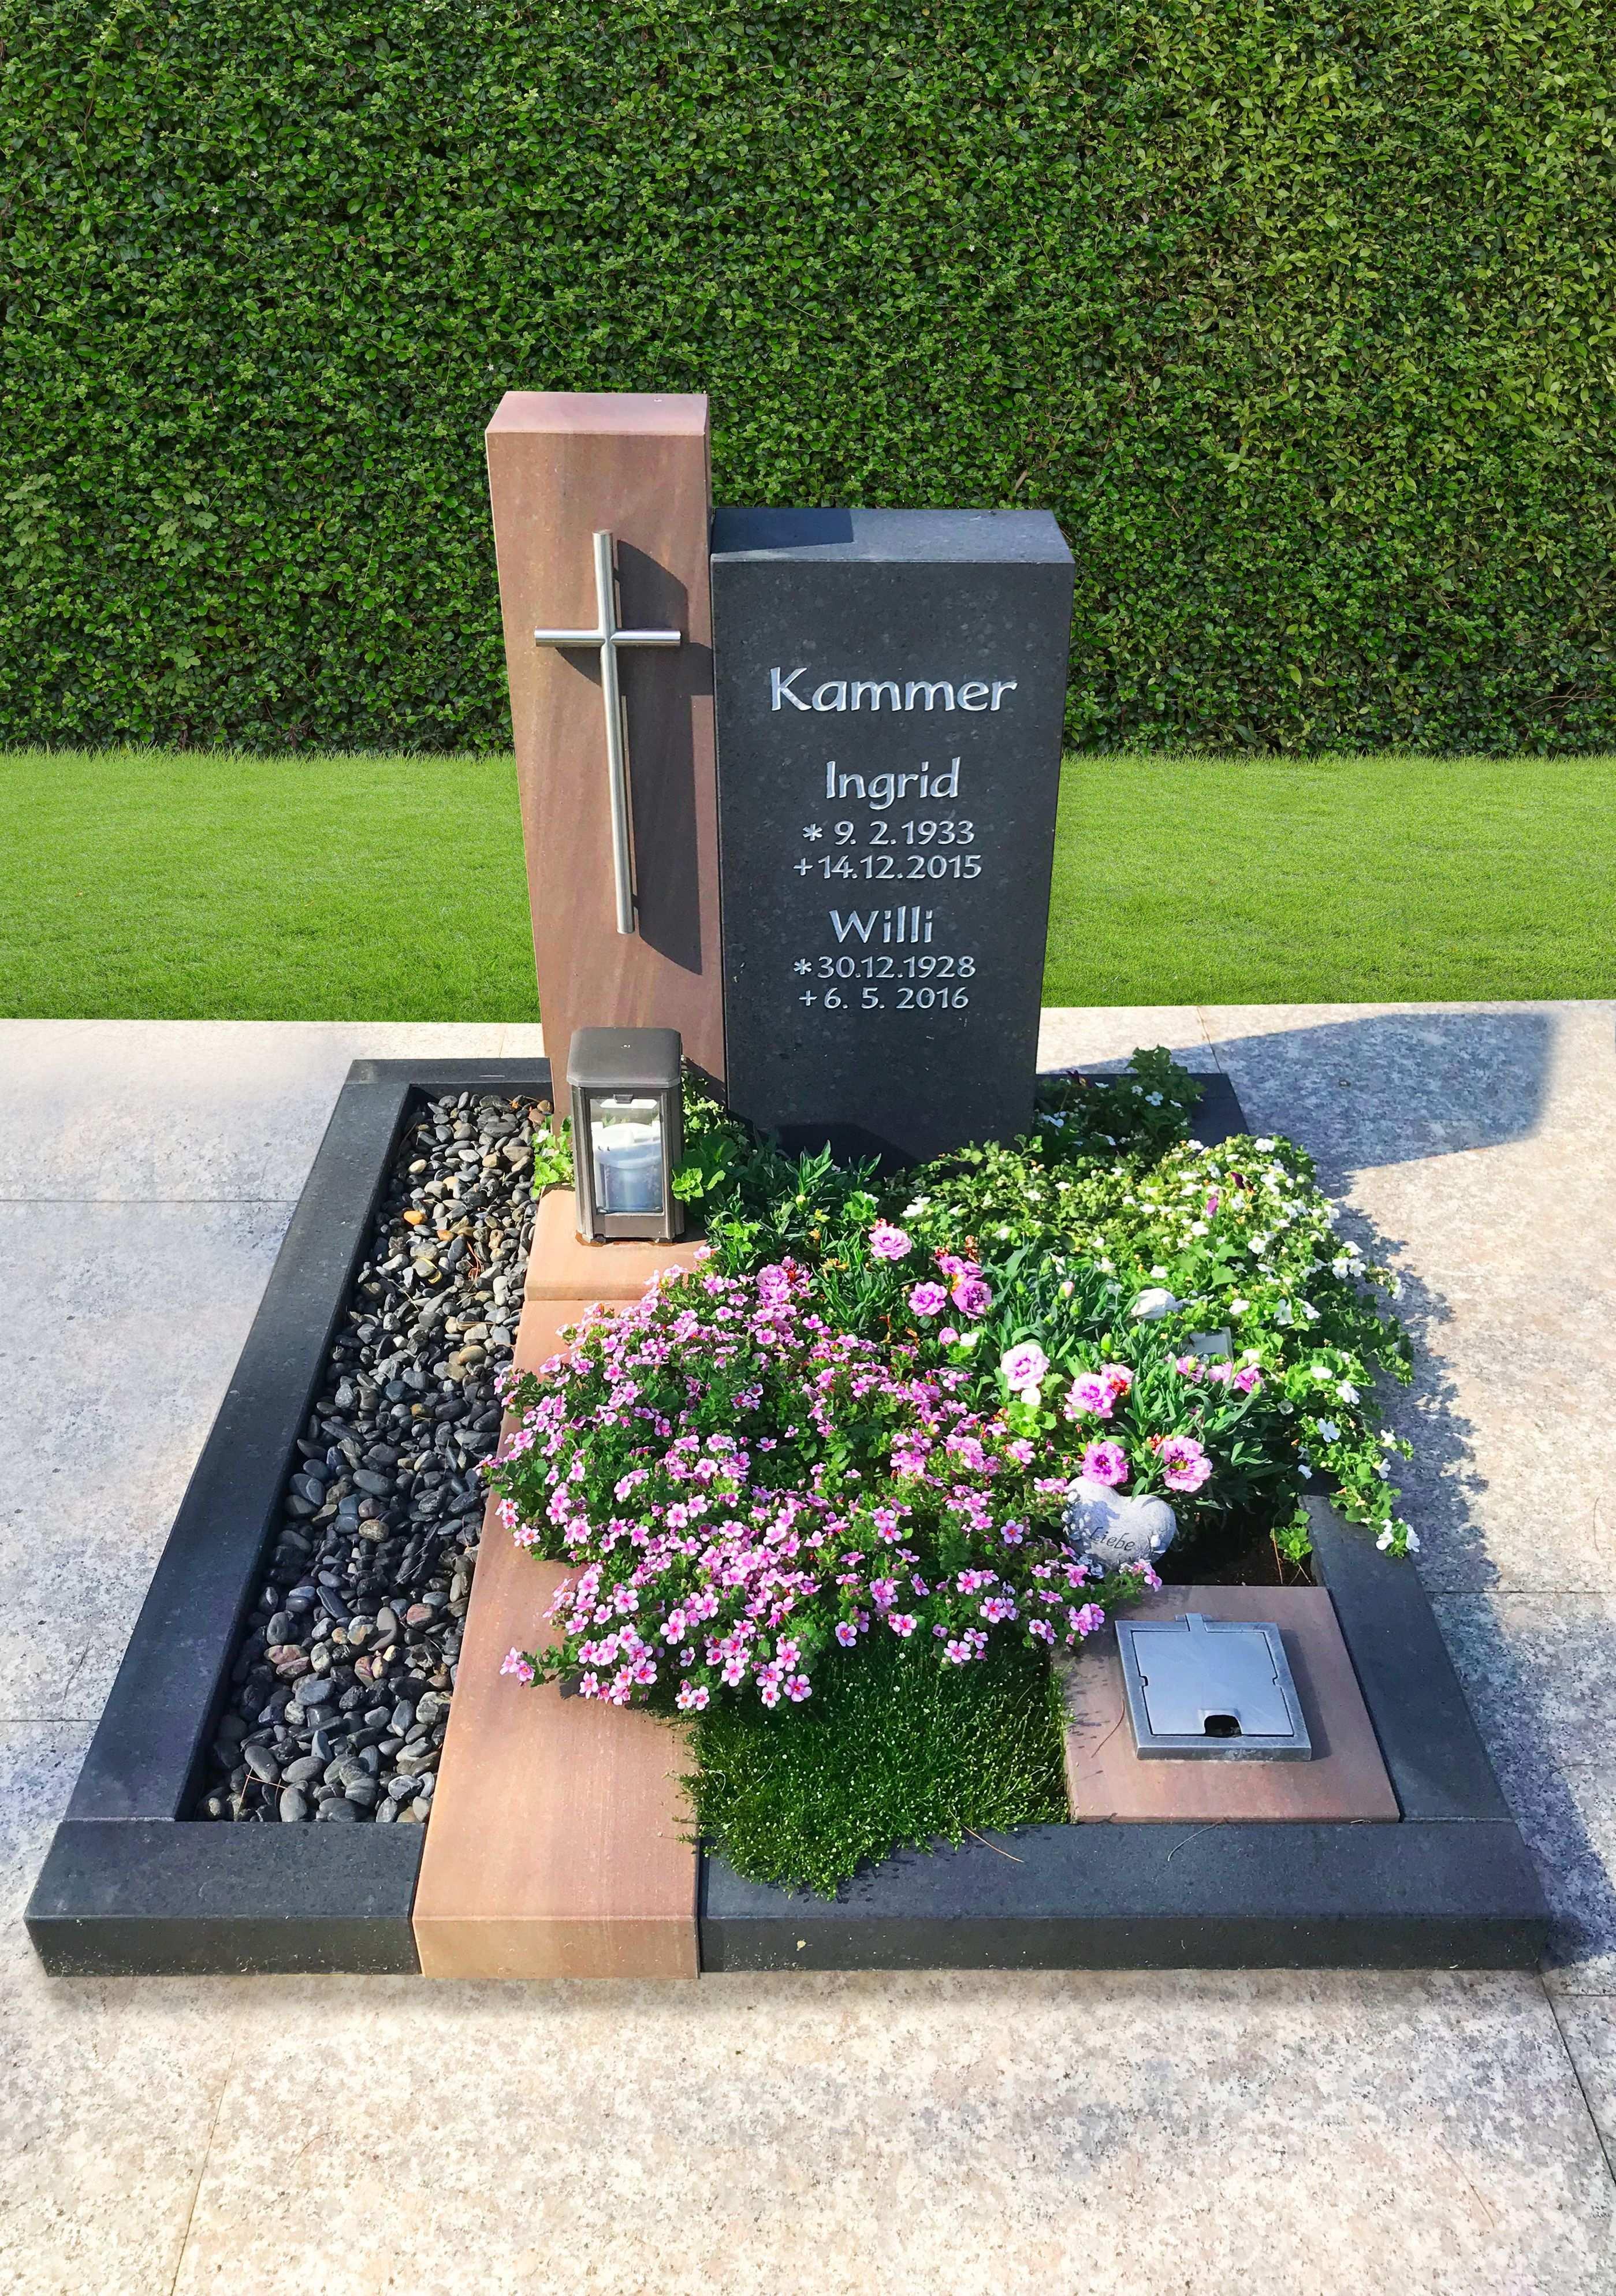 Grabmal Individualisiert Durch Materialmix Grabgestaltung Urnengrabgestaltung Grabgestaltung Allerheiligen